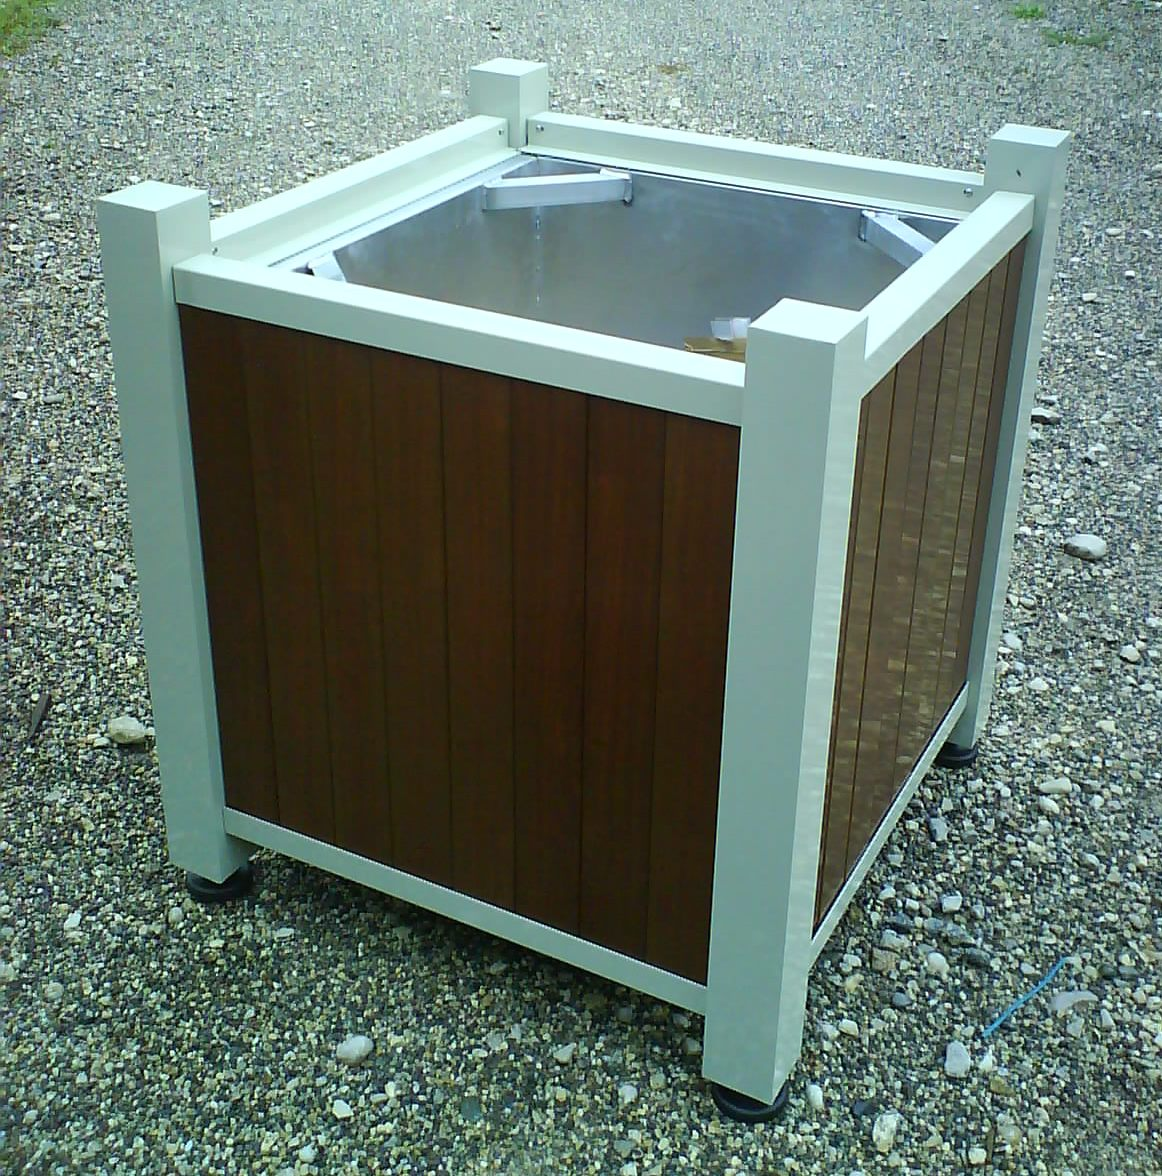 bac d 39 orangerie lattes facon bois. Black Bedroom Furniture Sets. Home Design Ideas